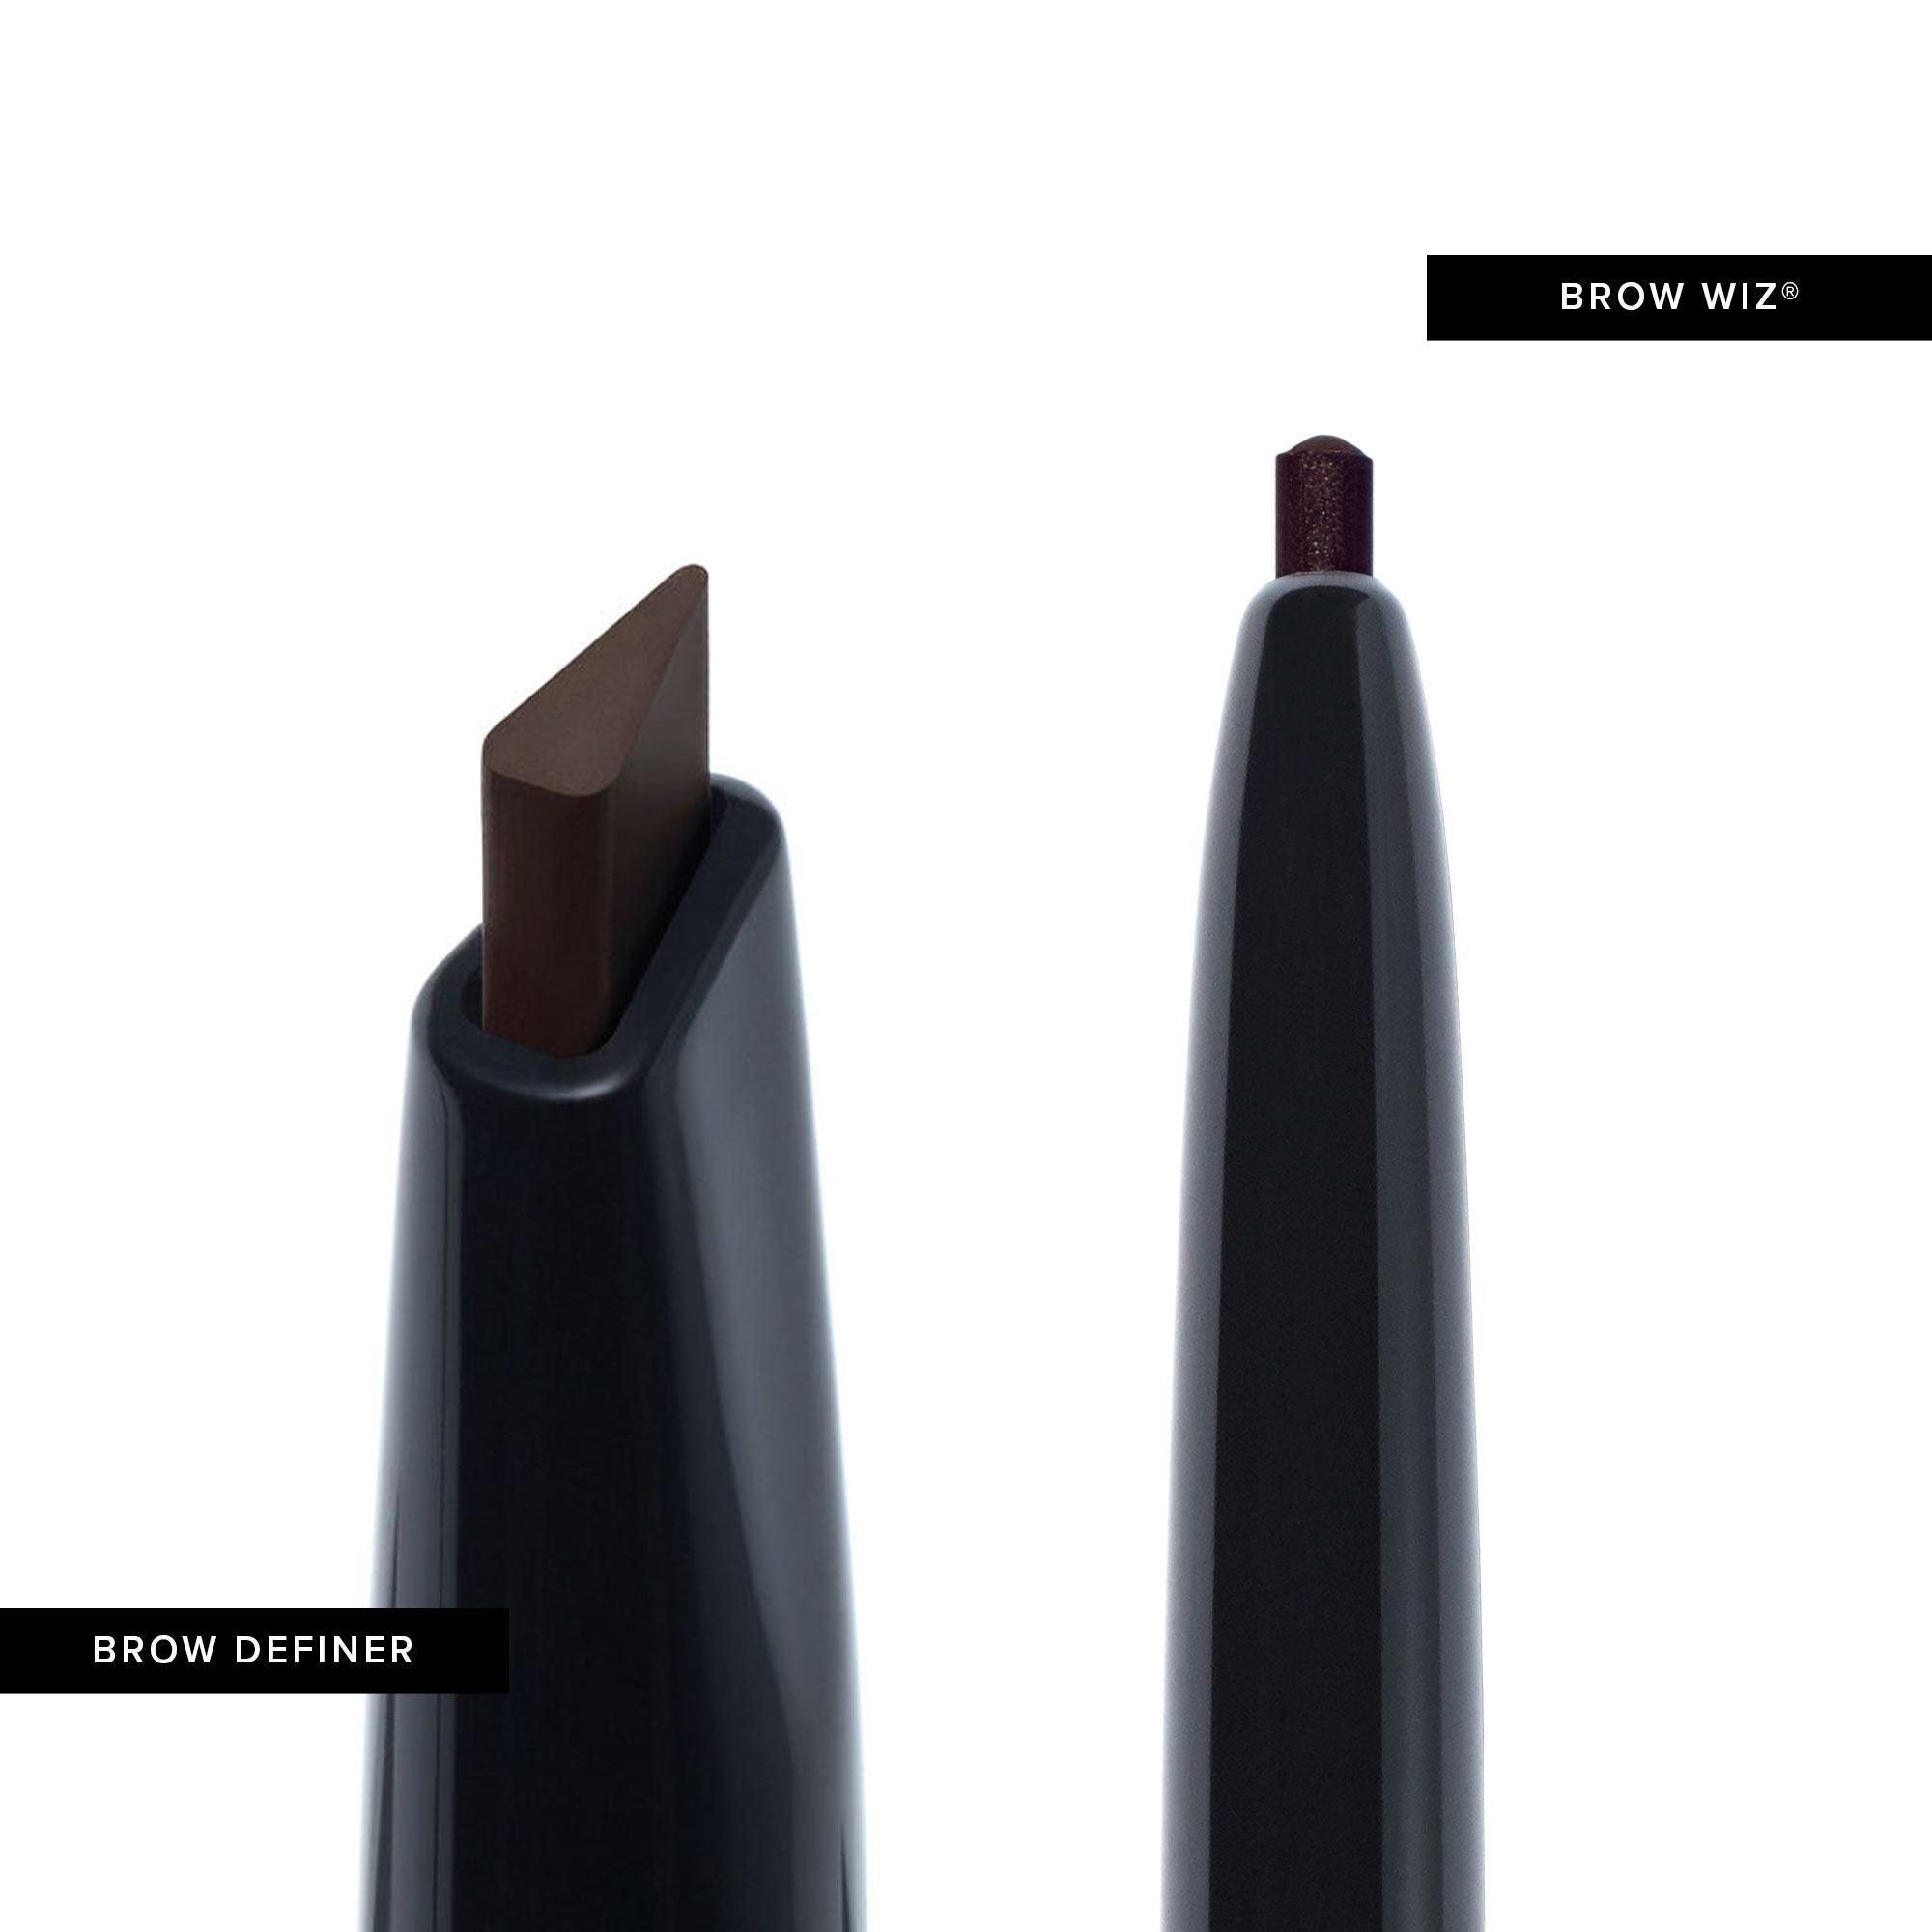 Natural & Polished Brow Kit - Dark Brown and Ebony